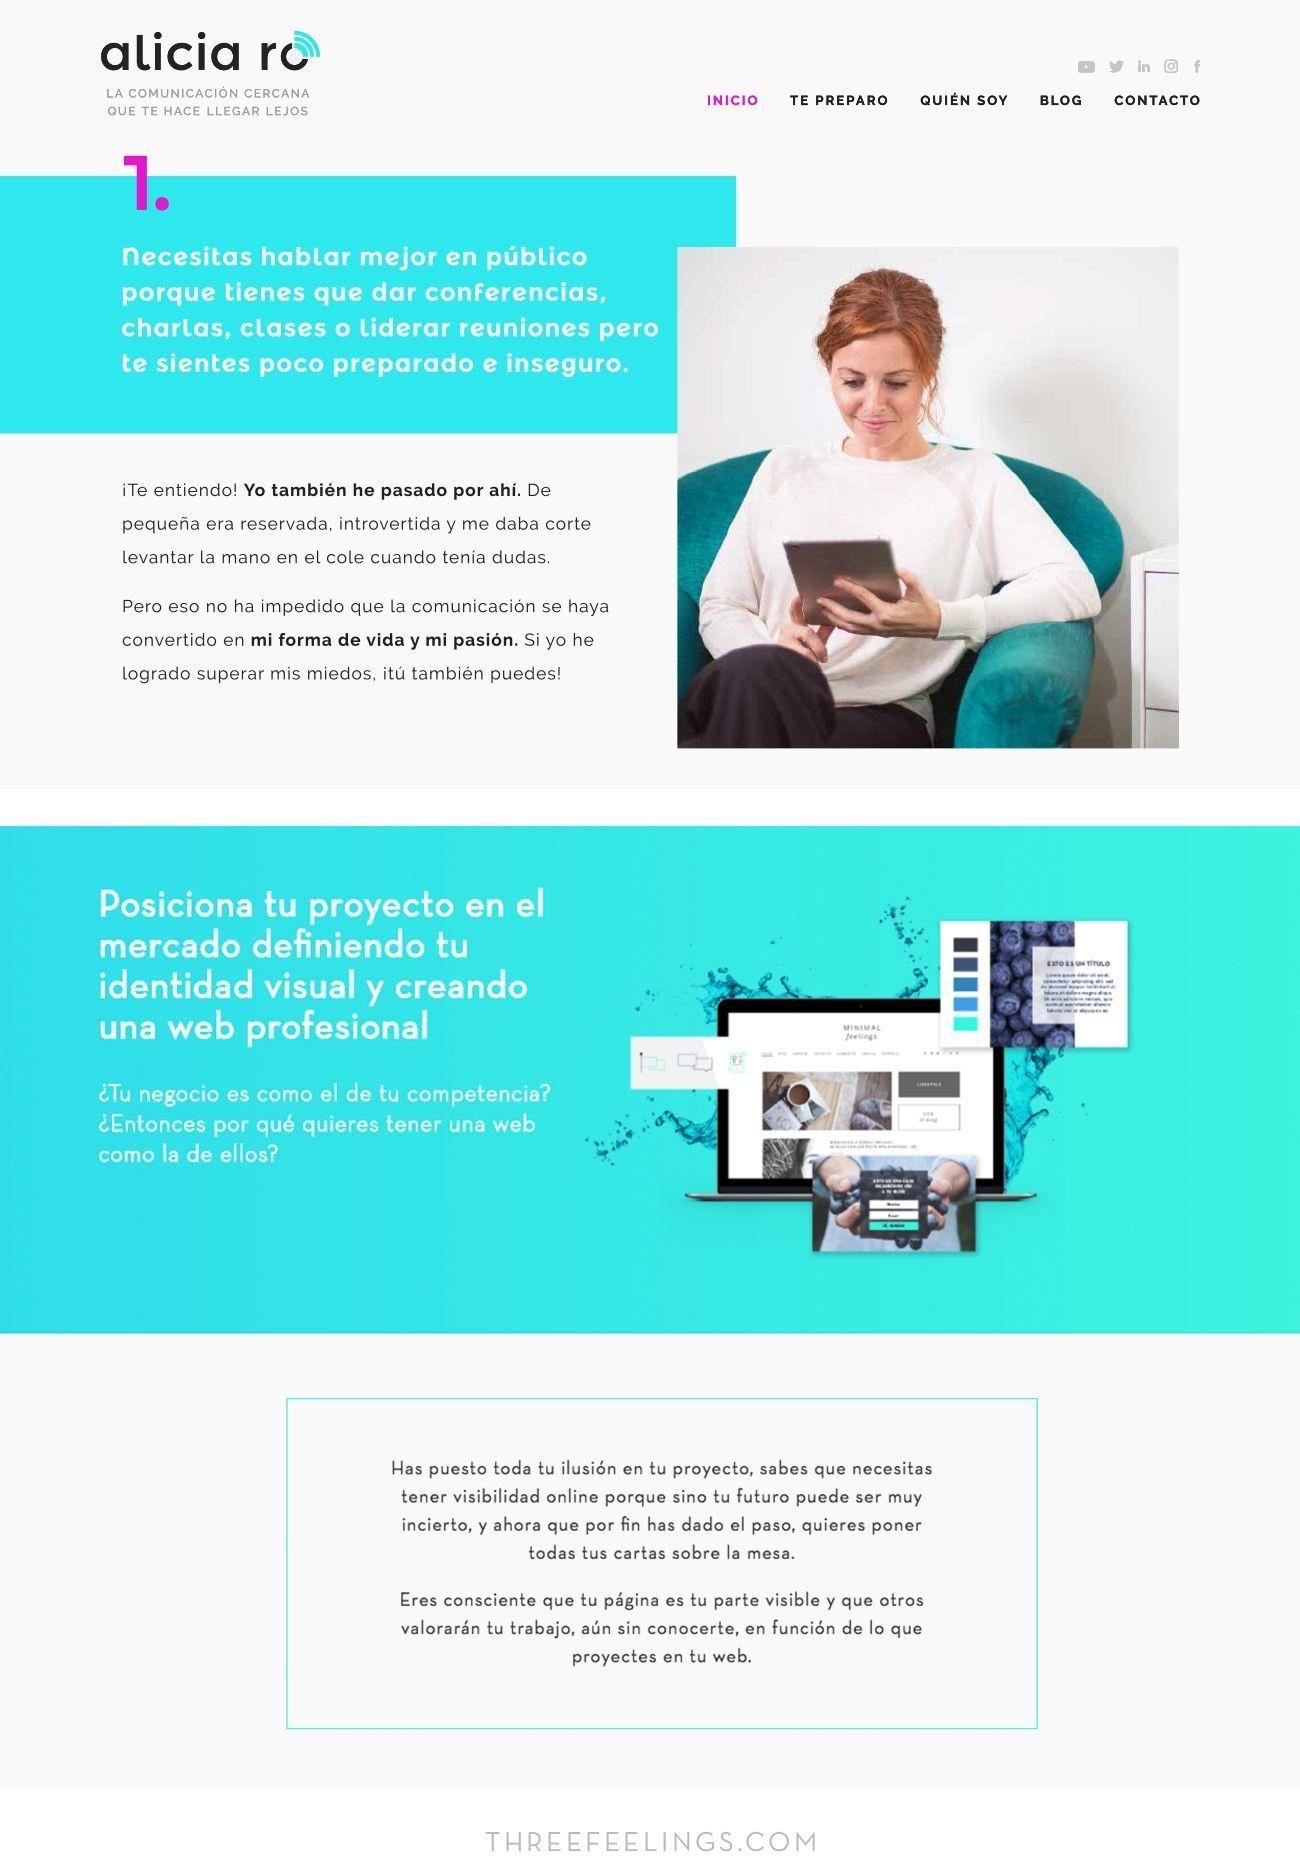 Tendencias de diseño web de 2017 - degradados fluor